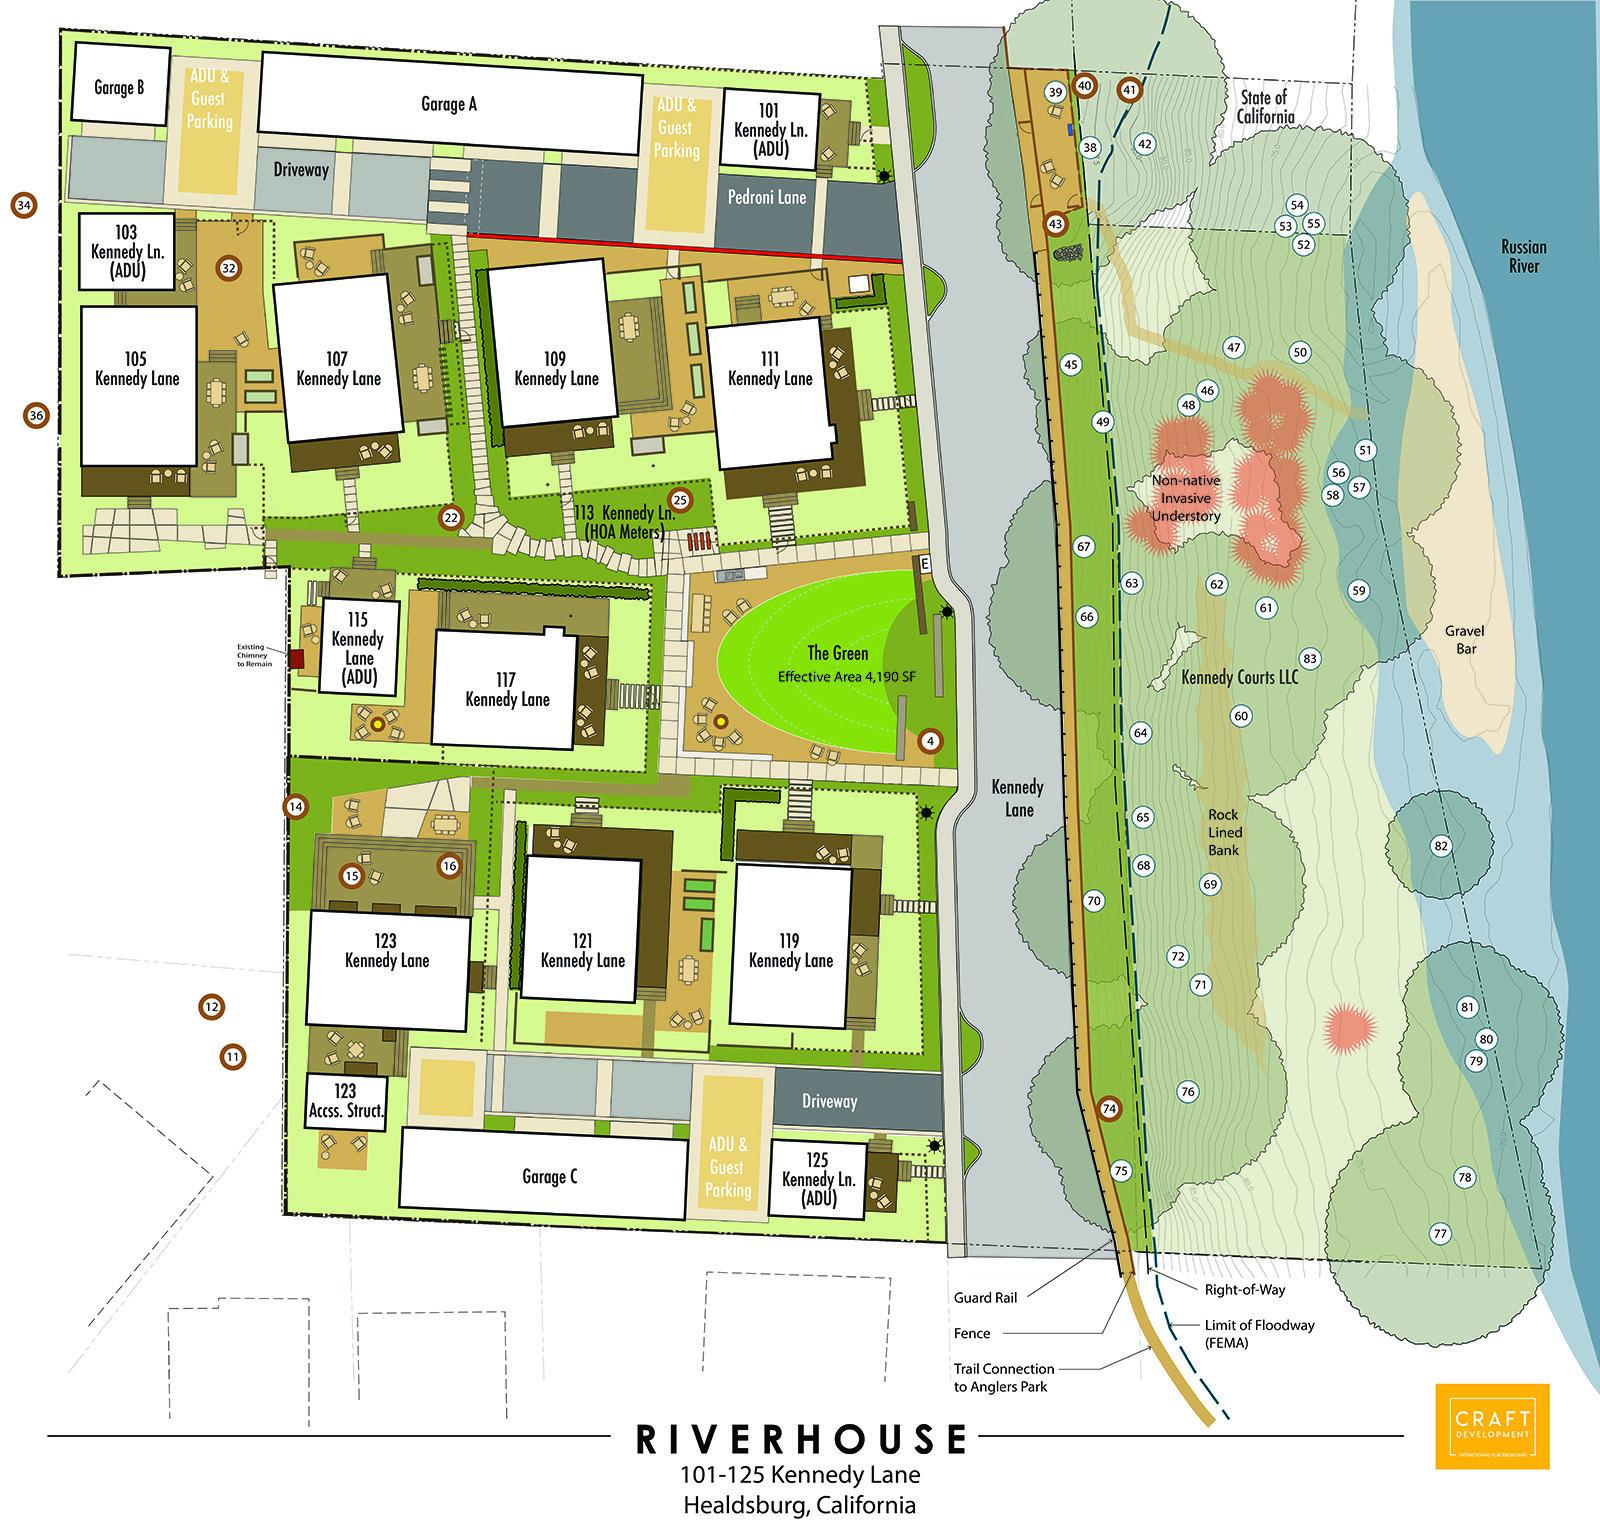 RESIZED_1600px_190828 RiverHouse Site Plan_Corrected.jpg